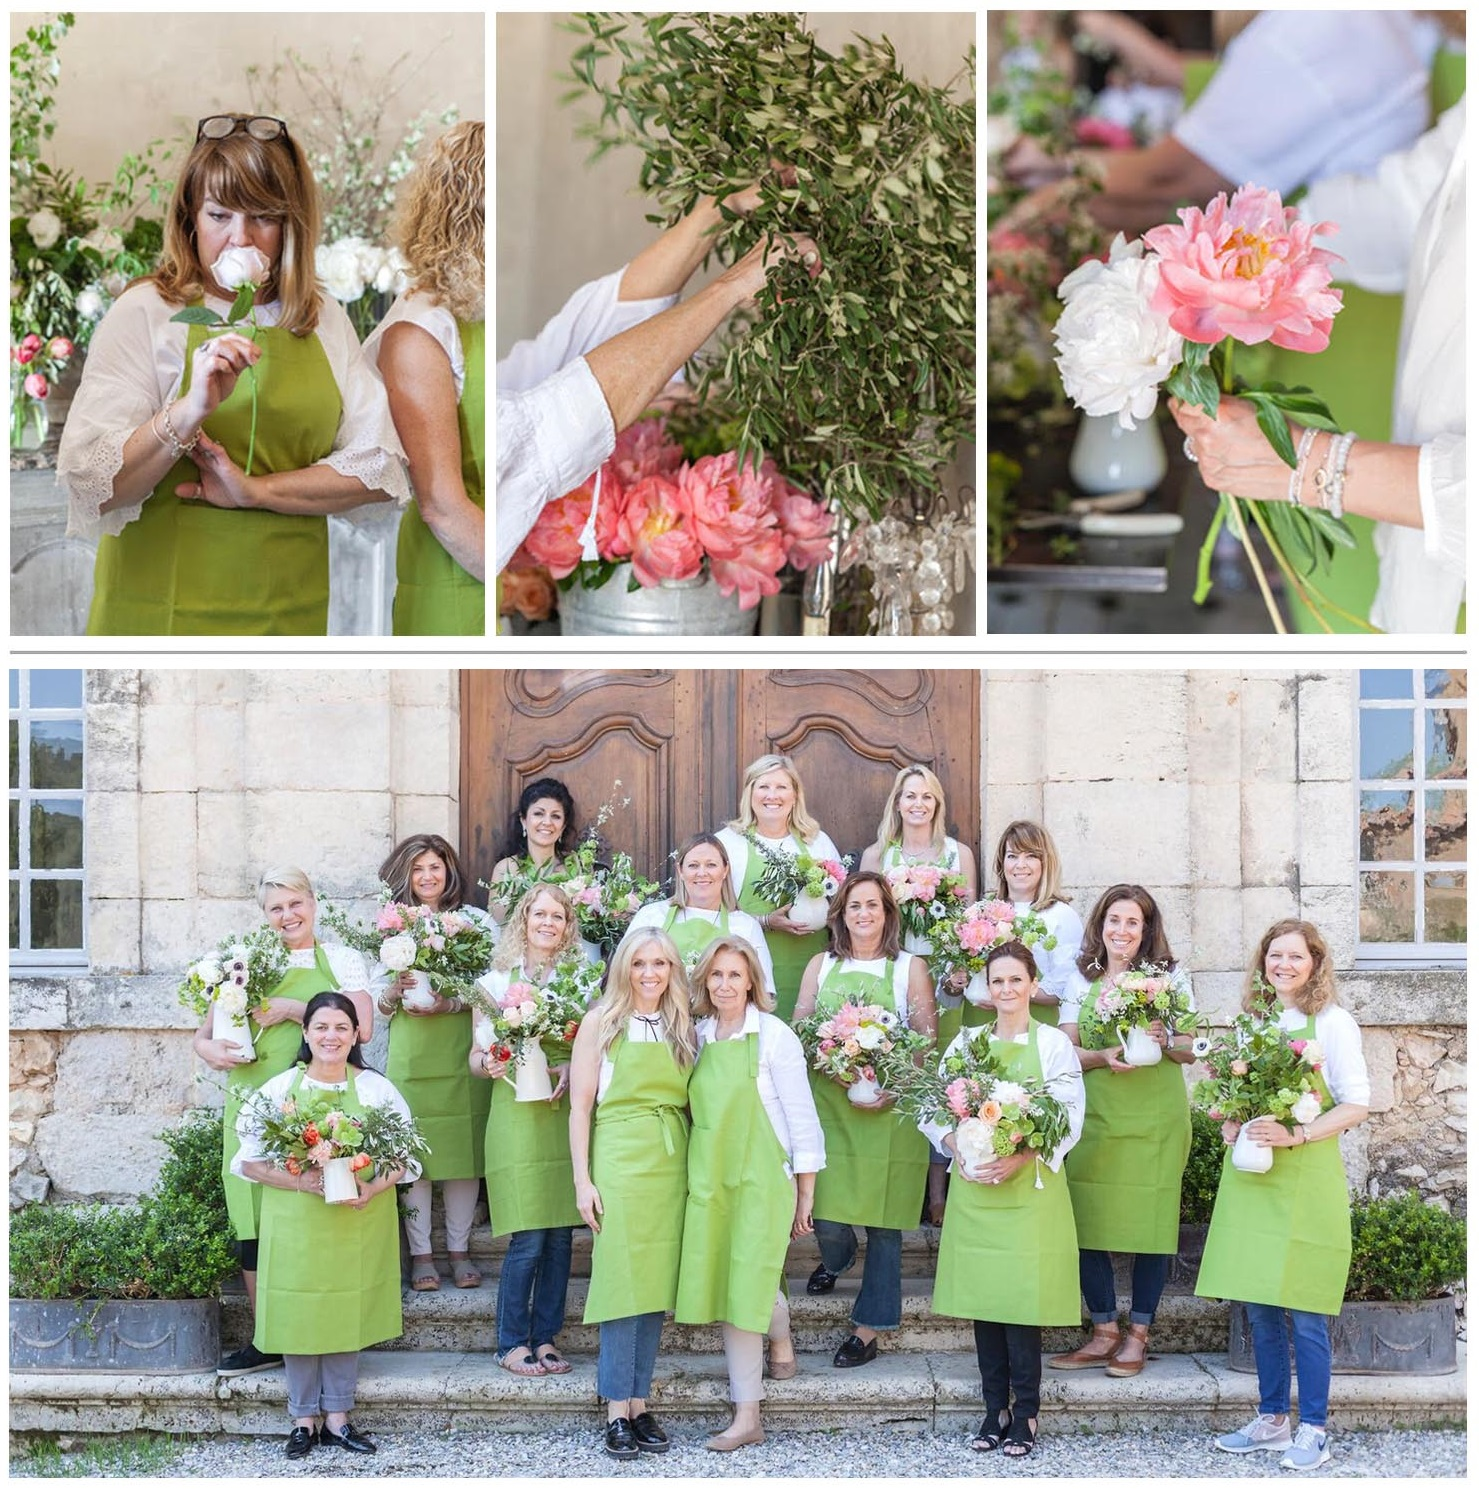 provence tour French chateau flower workshop sandra sigman sharon santoni